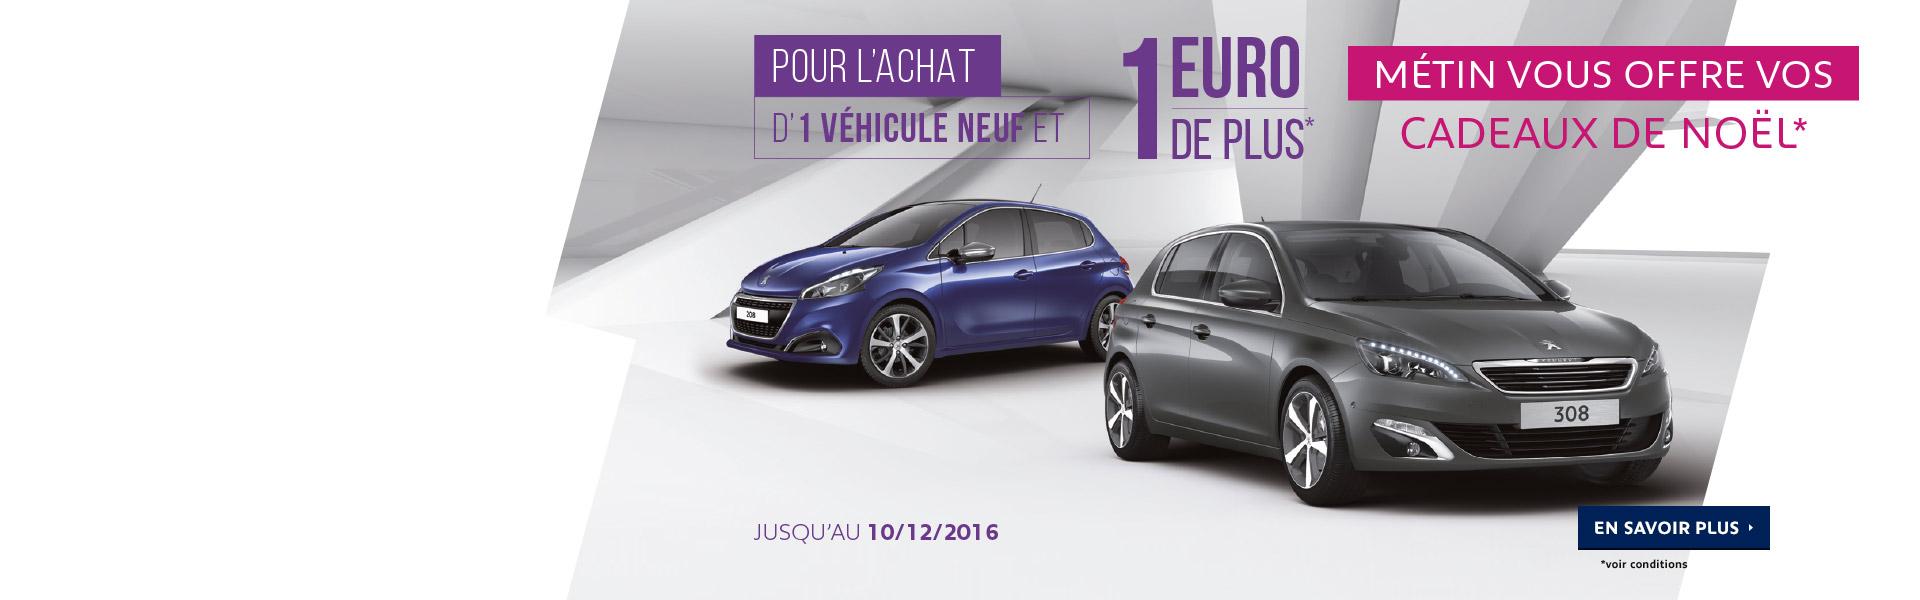 Opération Peugeot Métin